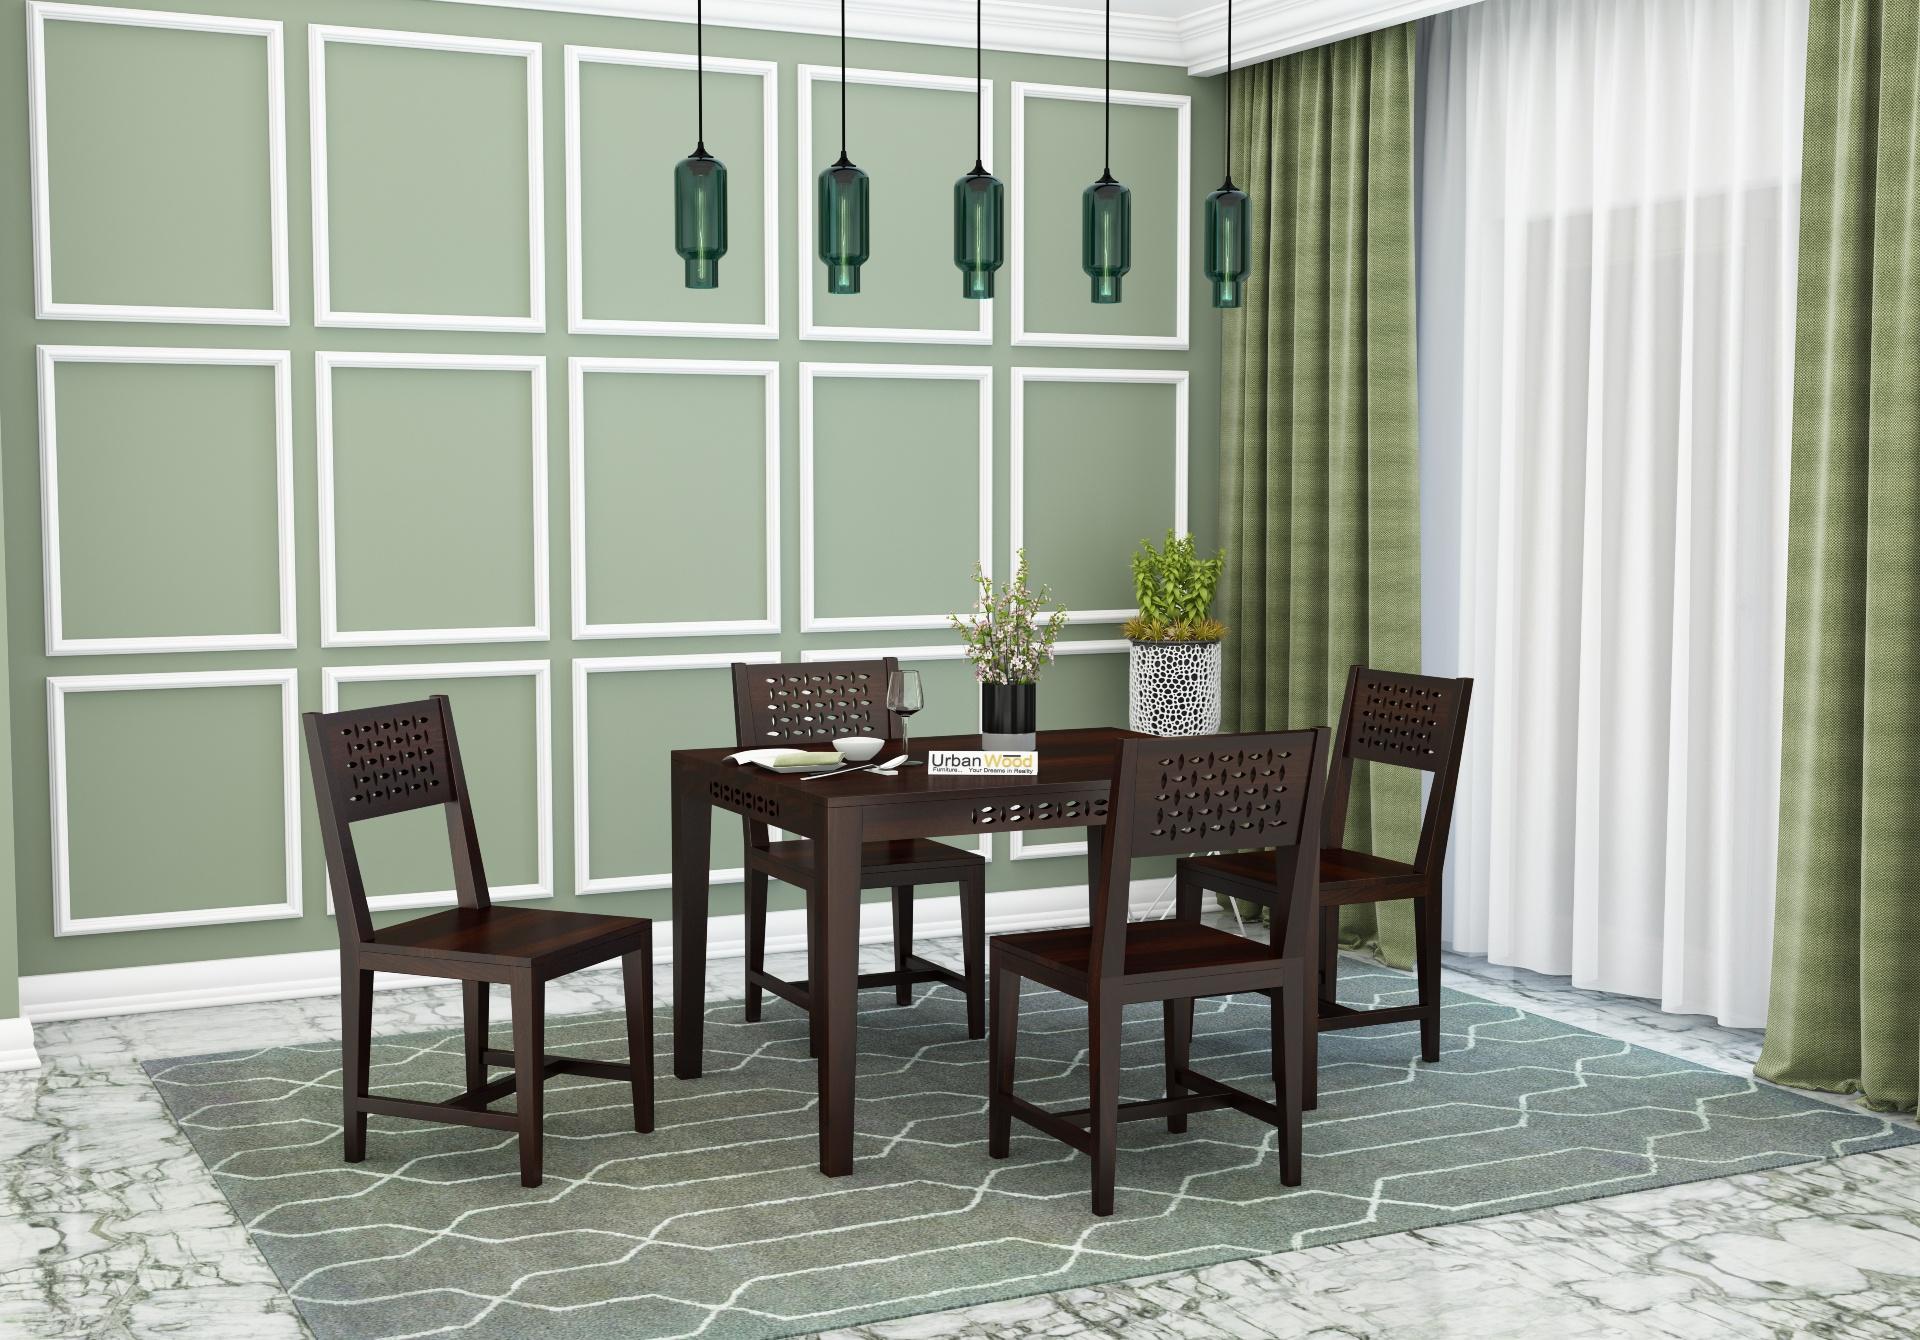 Woodora 4-Seater Dining Set <small>( Walnut Finish )</small>